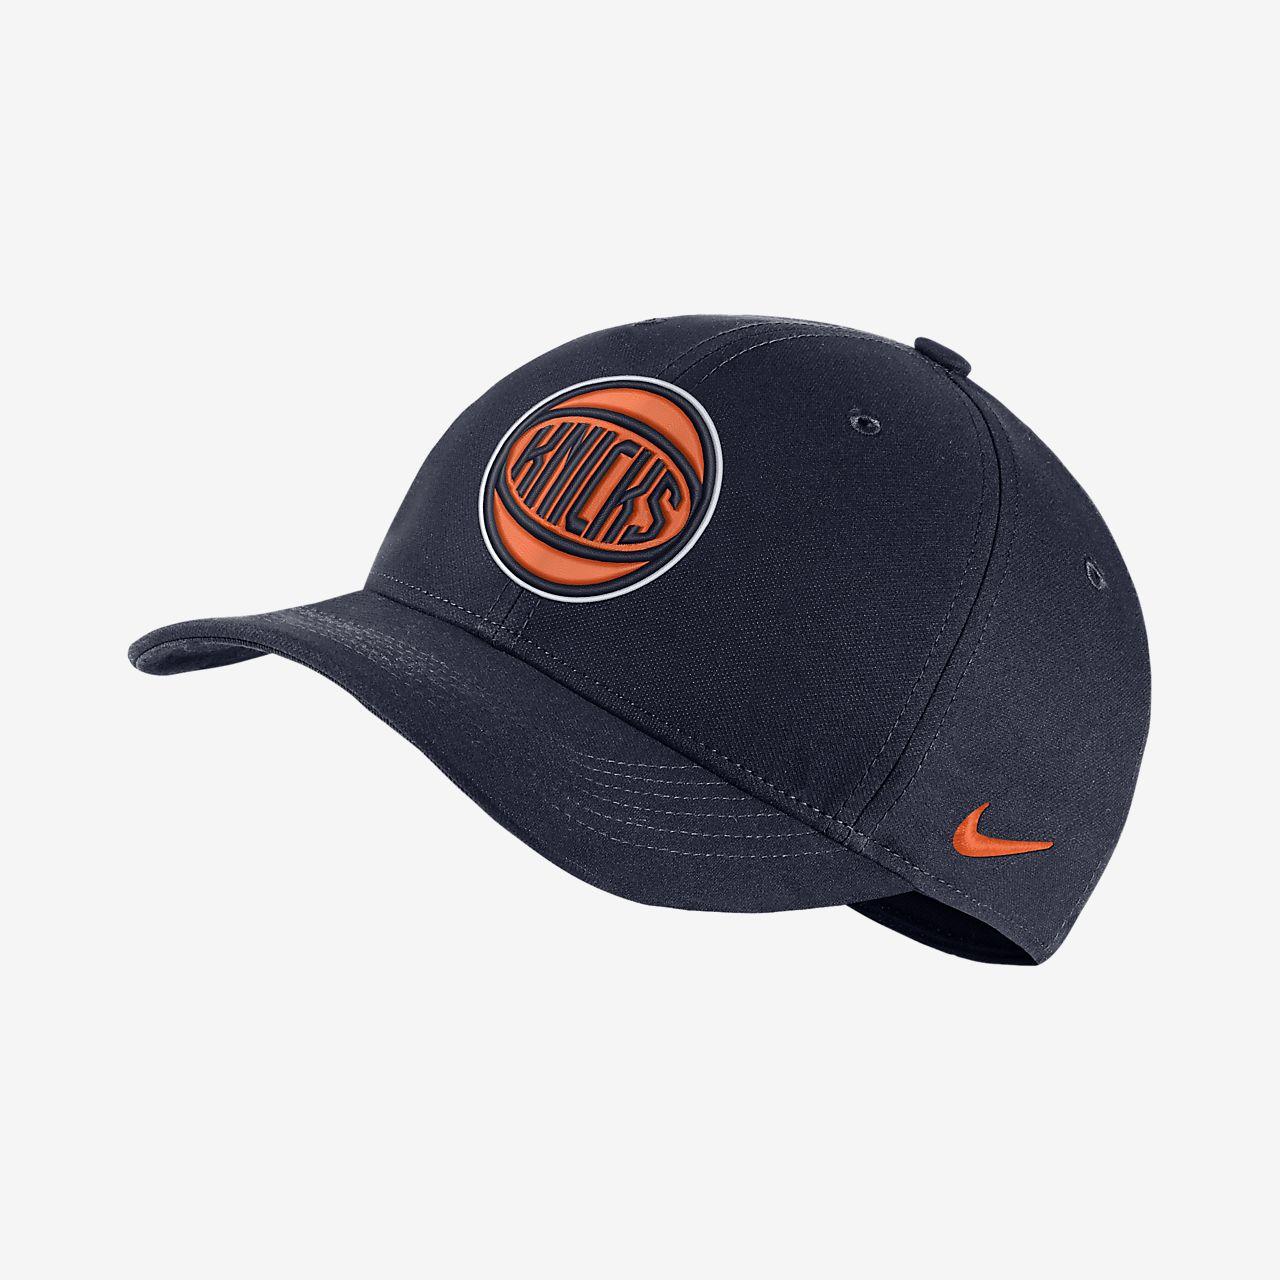 Casquette NBA New York Knicks City Edition Nike AeroBill Classic99